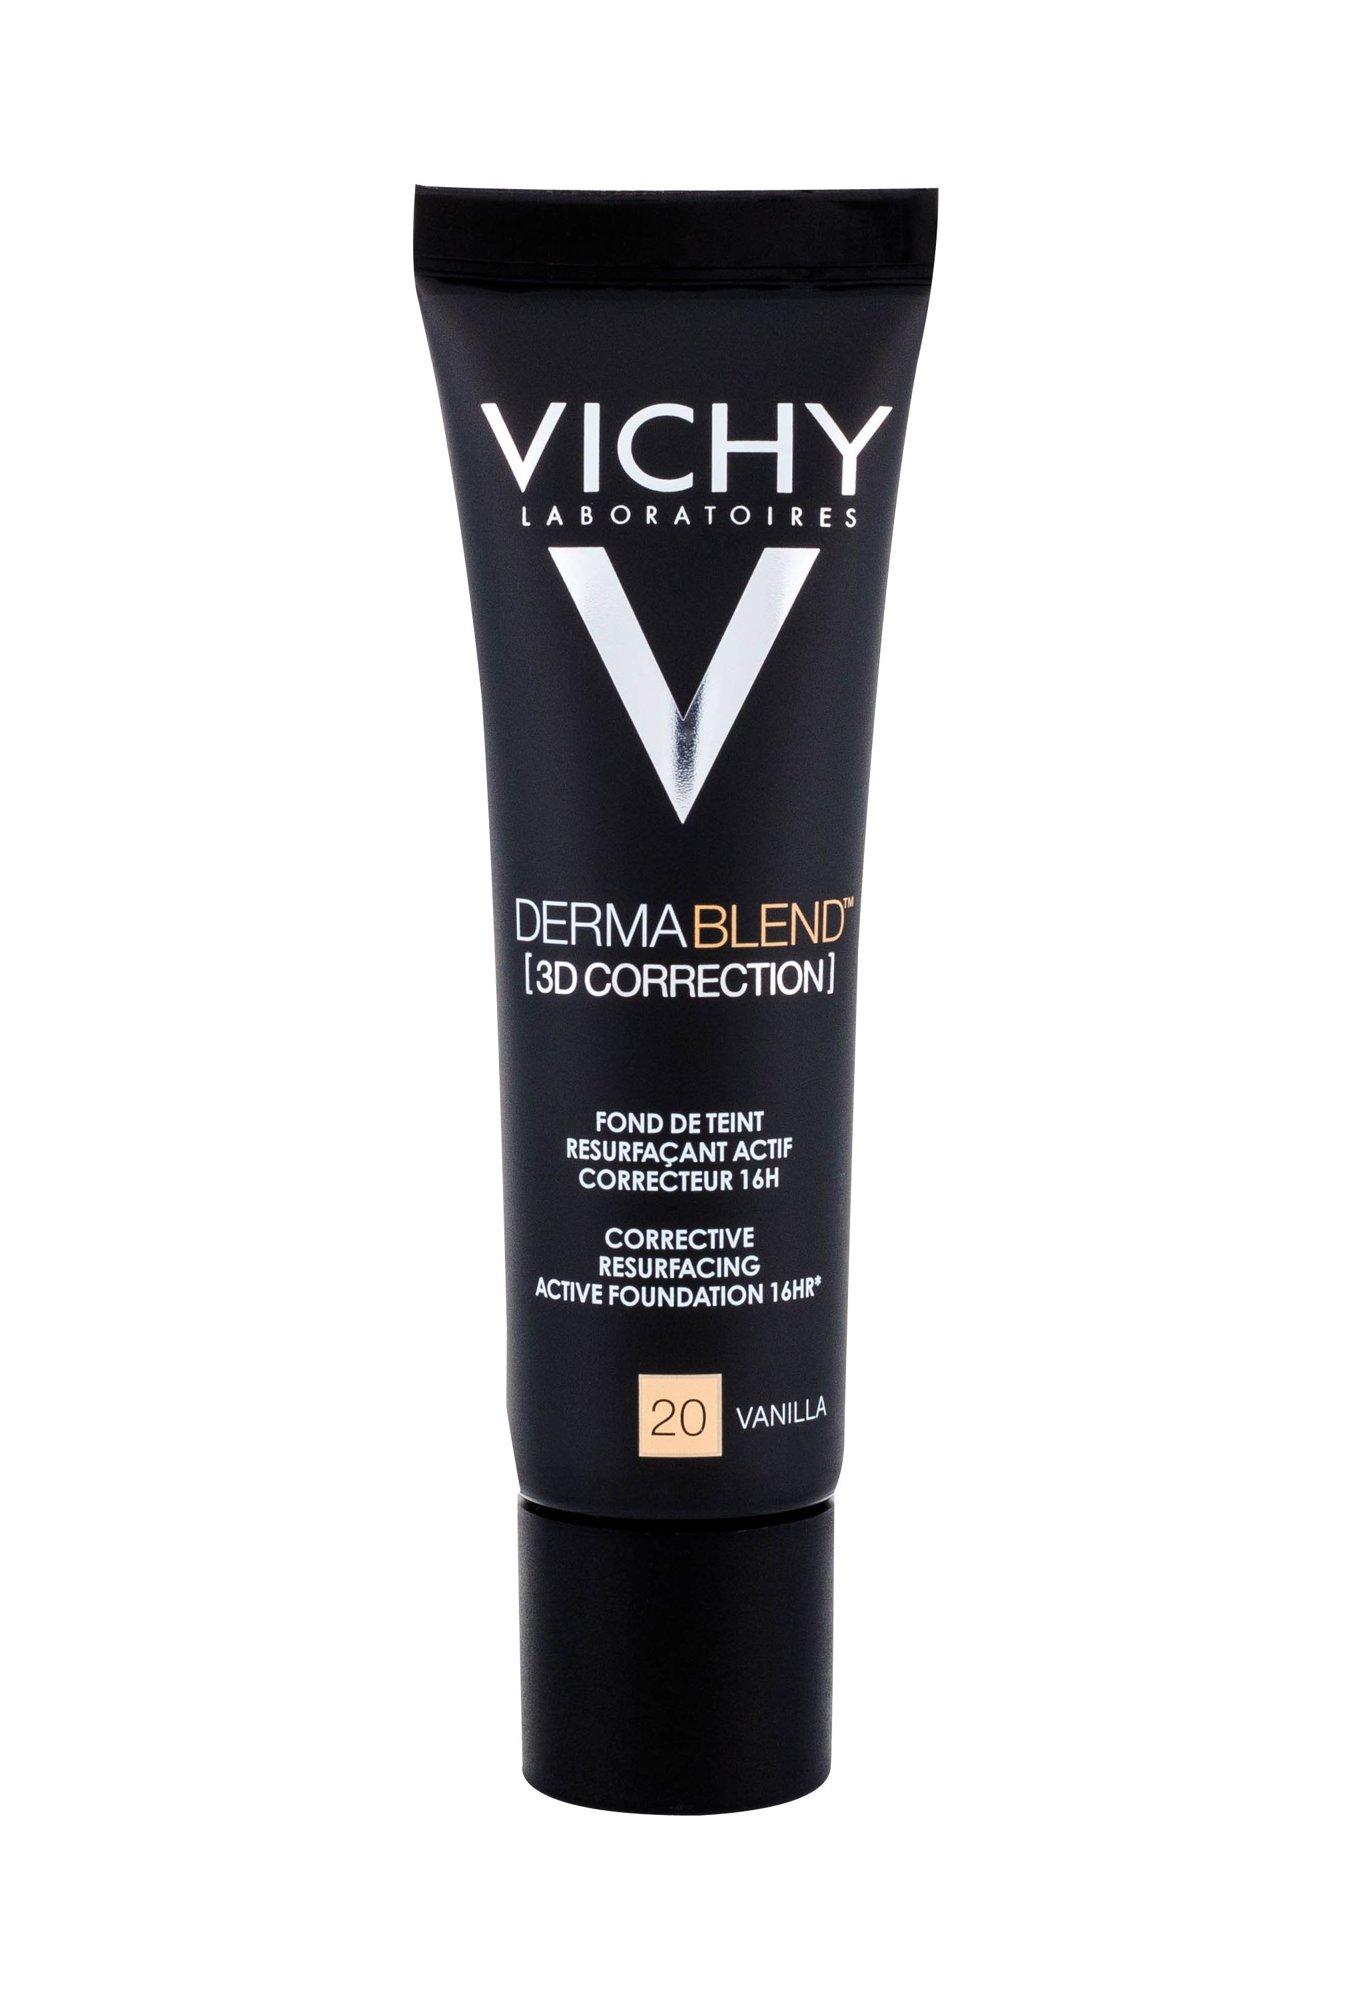 Vichy Dermablend Makeup 30ml 20 Vanilla